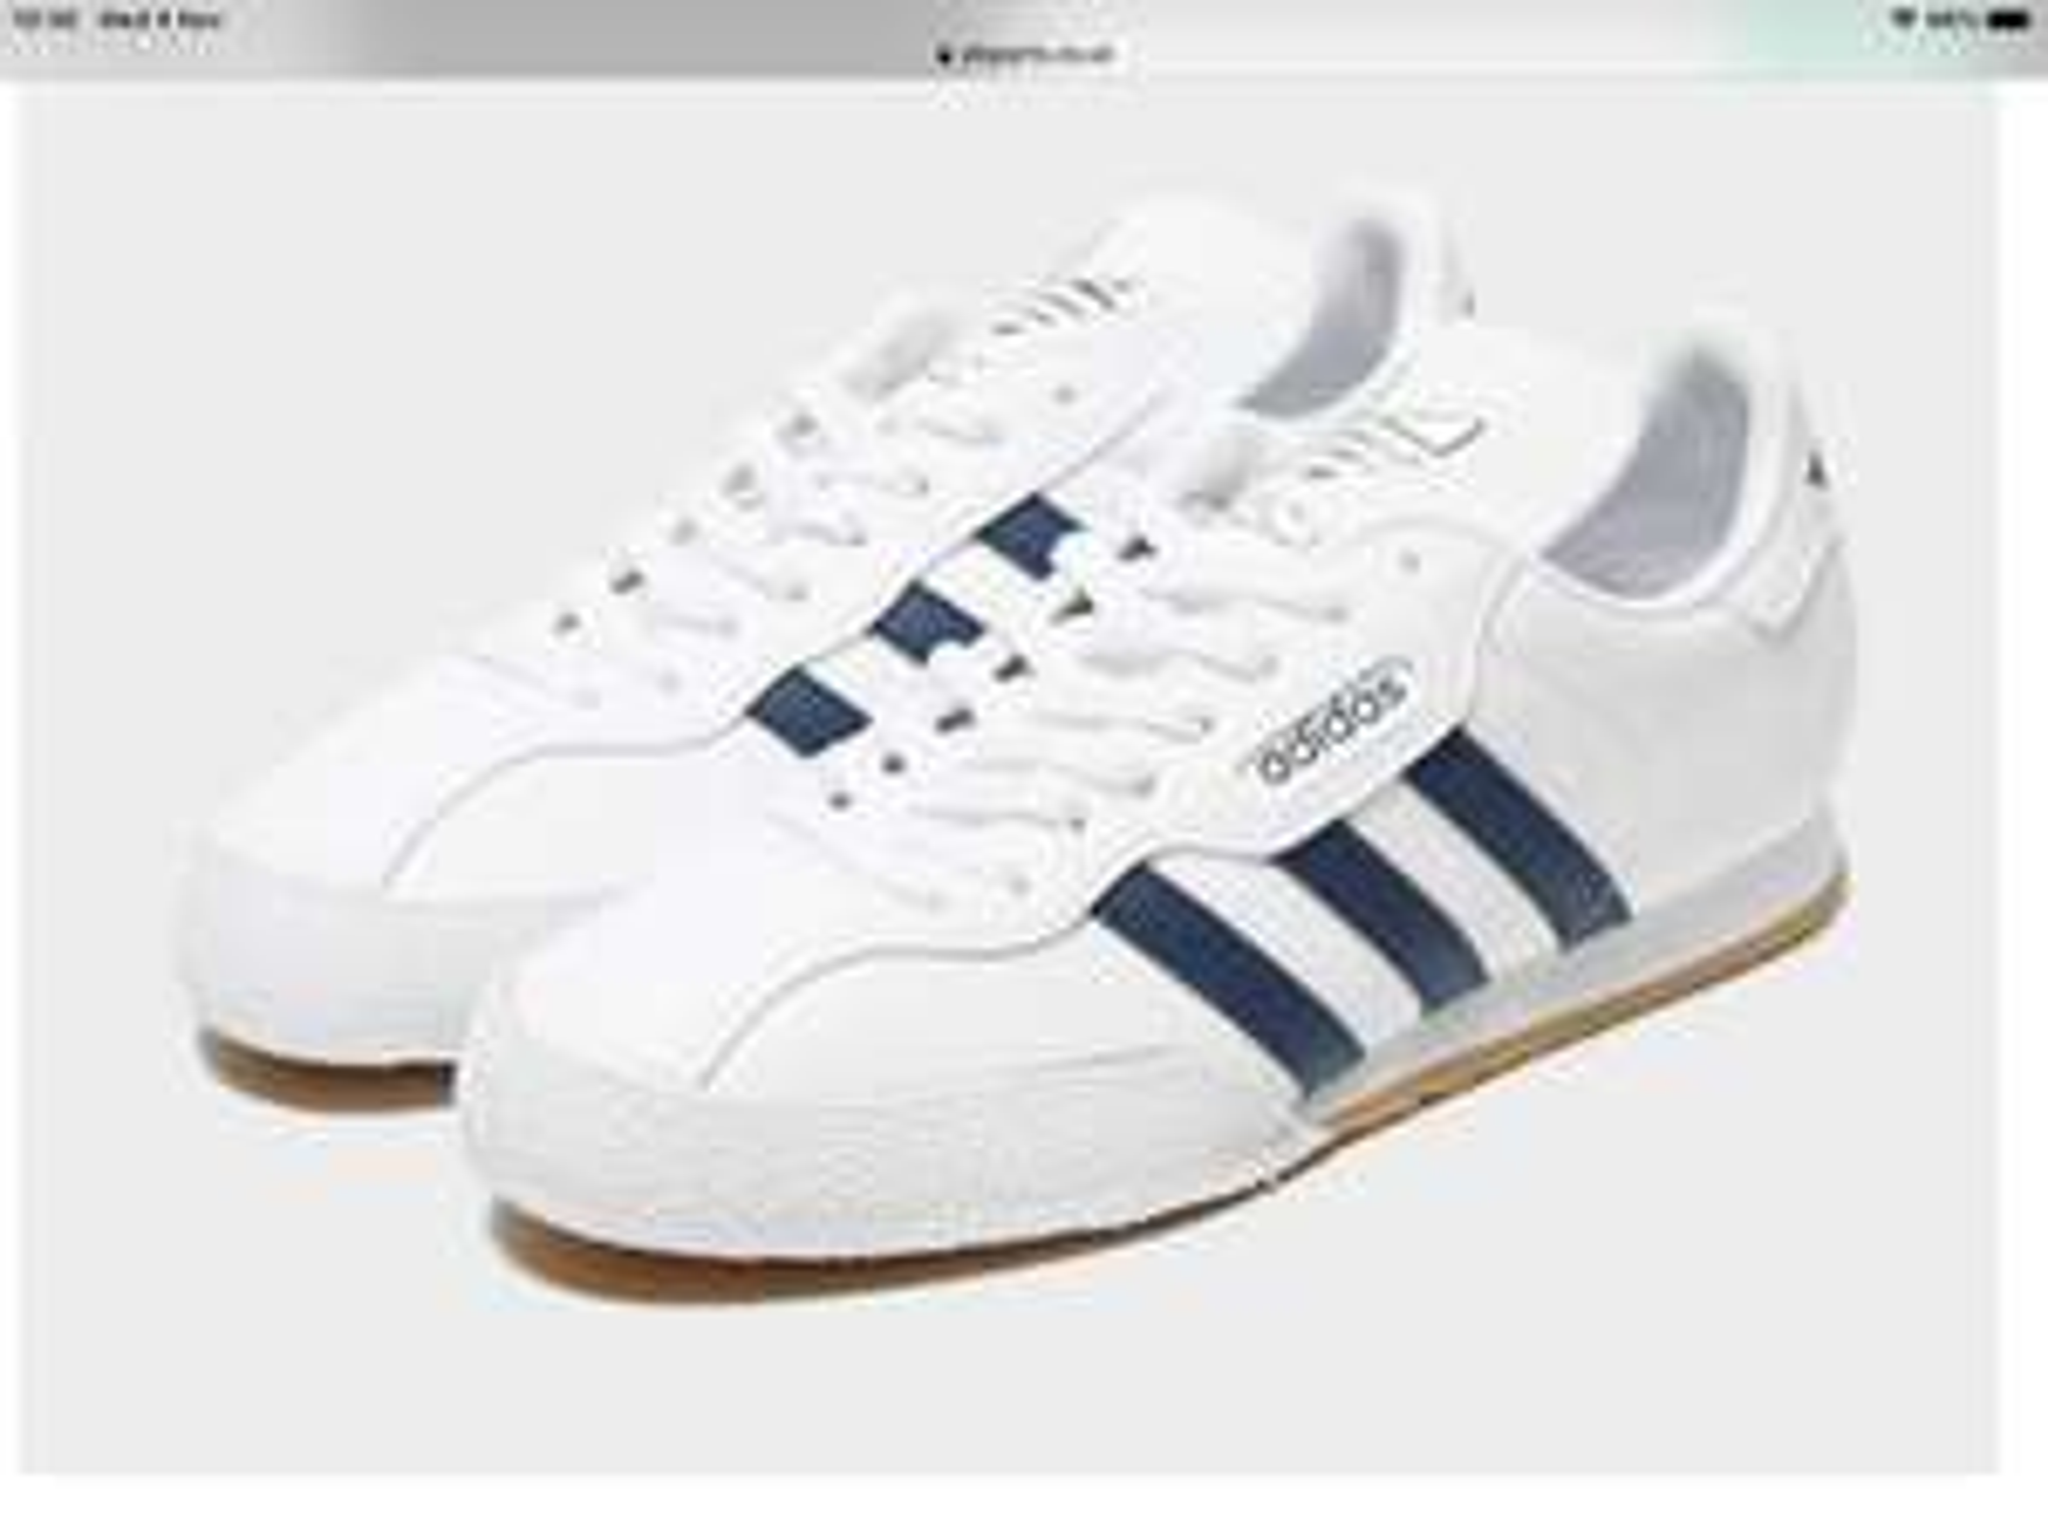 Adidas Samba Super Trainers - £50 @ JD Sports